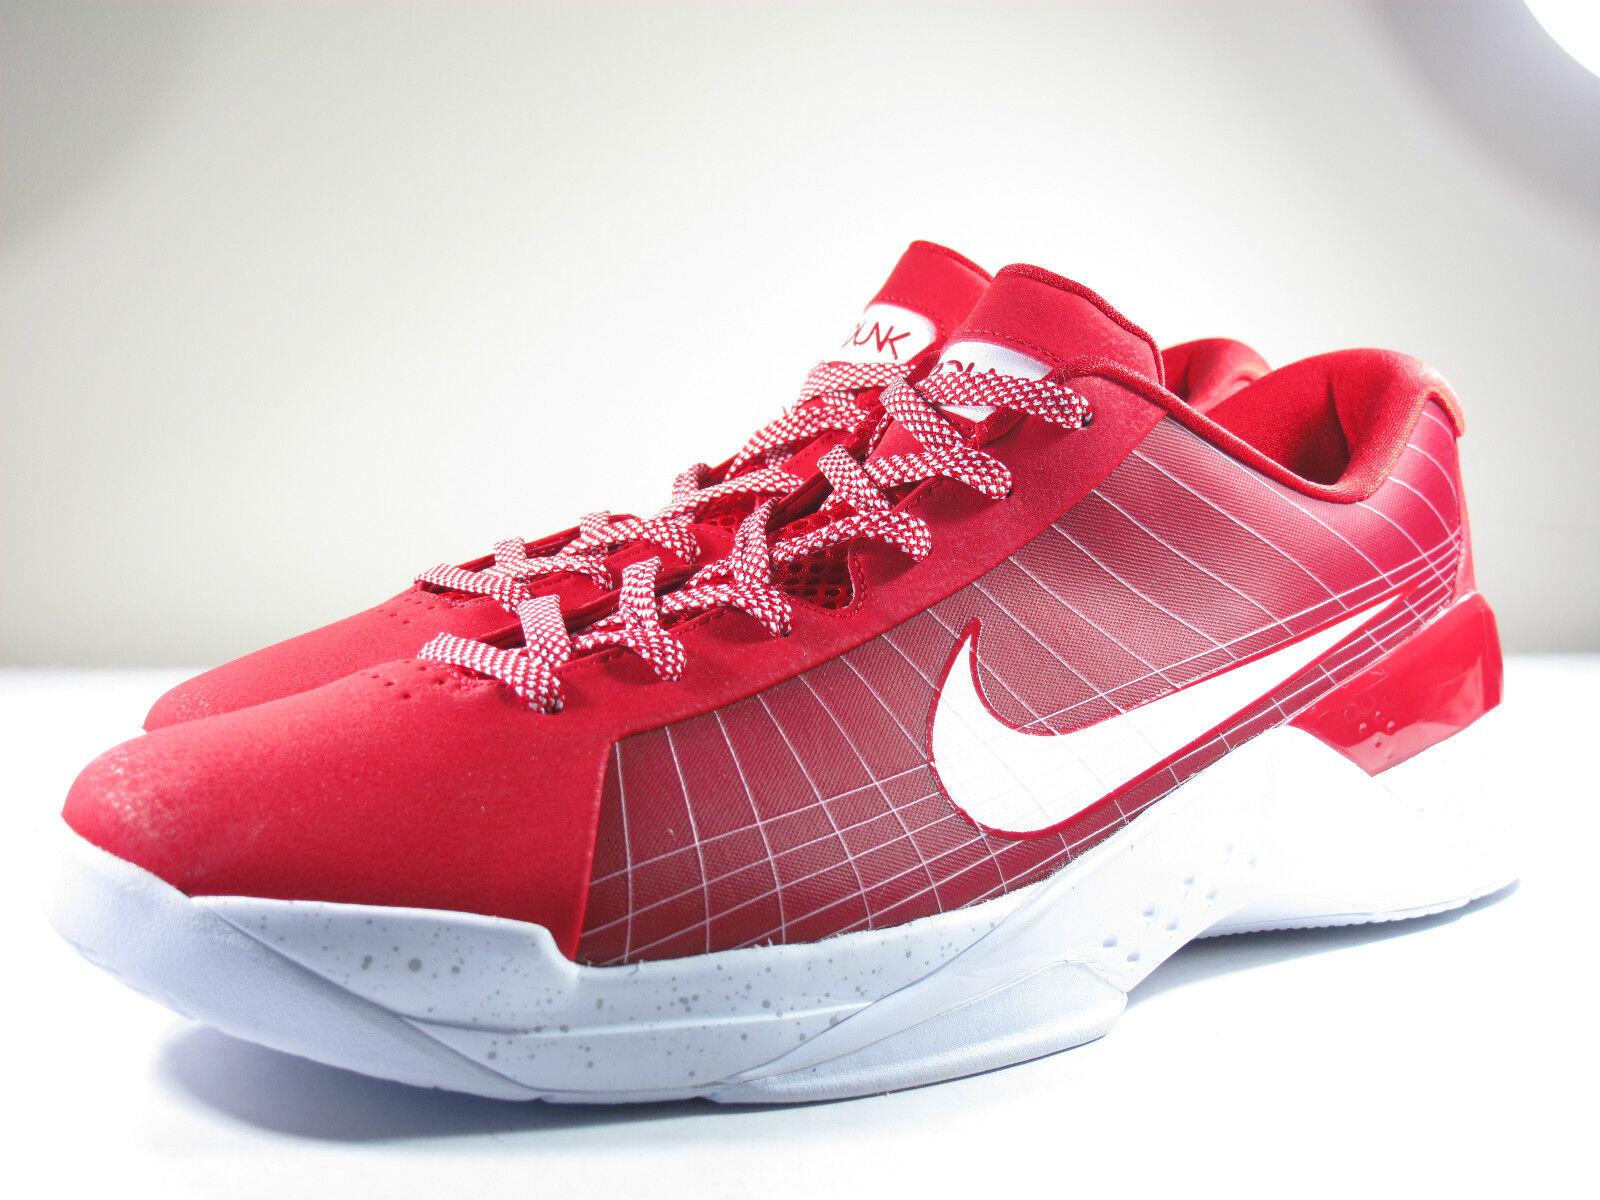 Ds Nike 2010 Hyperdunk Sport Rojo 12 Penny Air Max 180 vigor Olímpicos 90 1 95